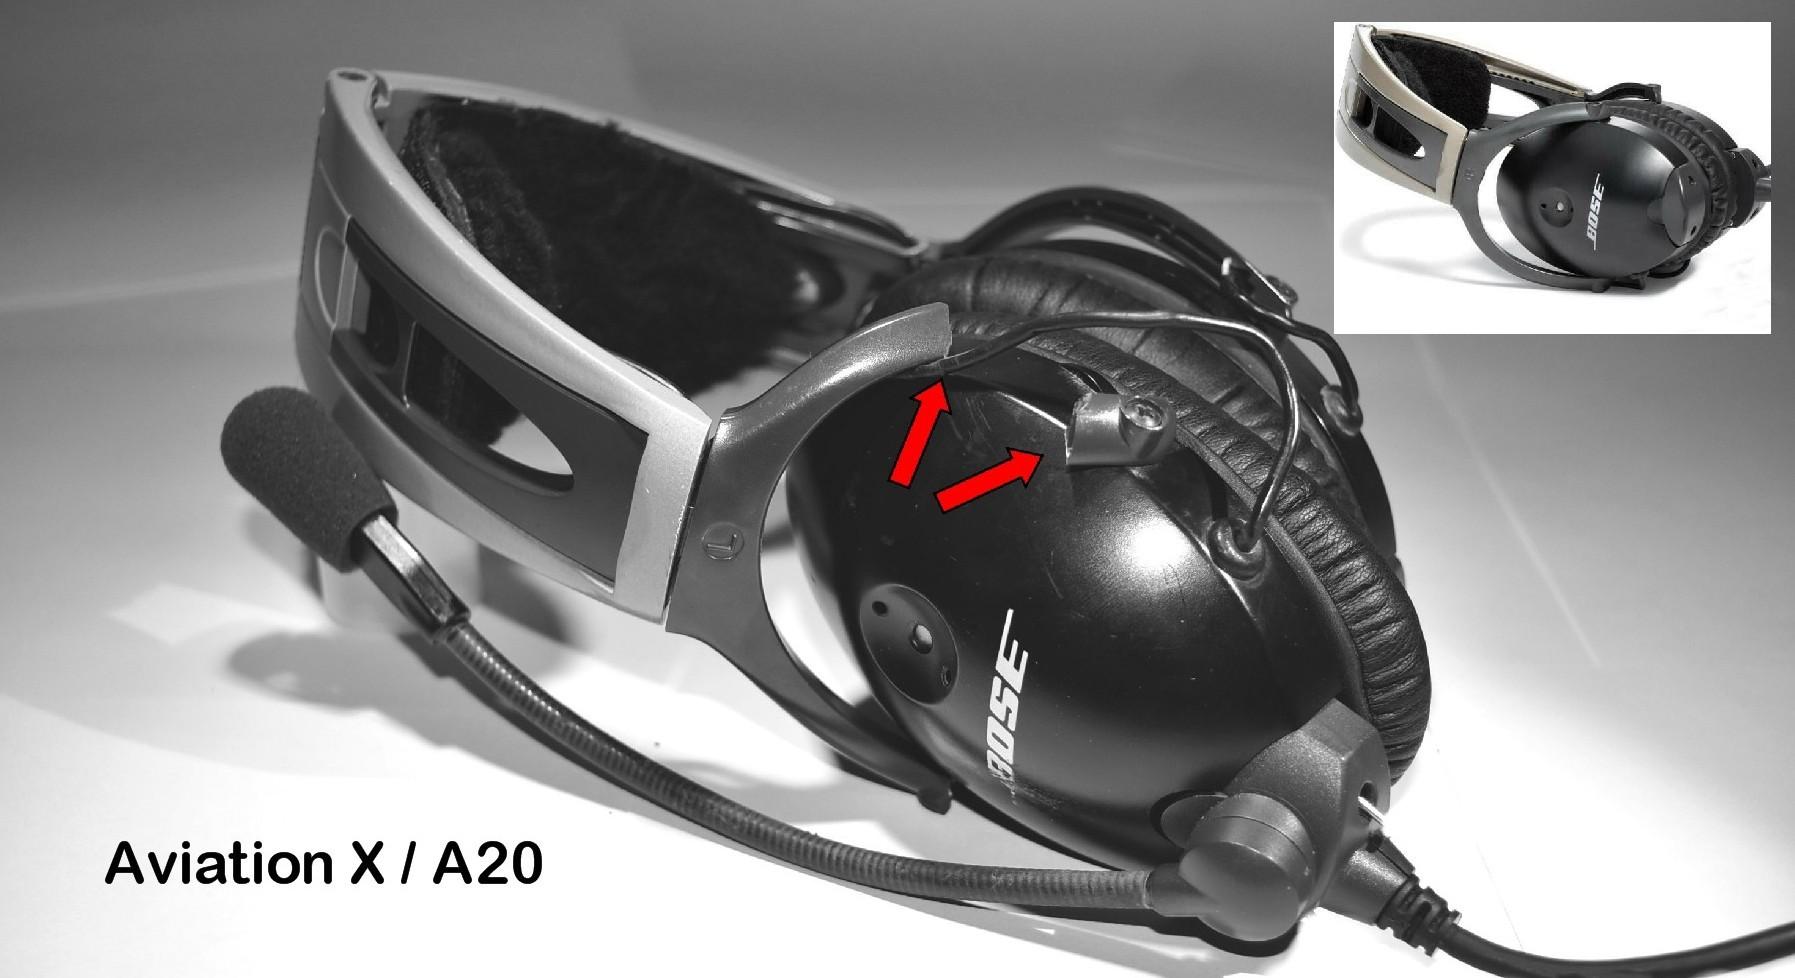 Aviation Headset repair Service Centre